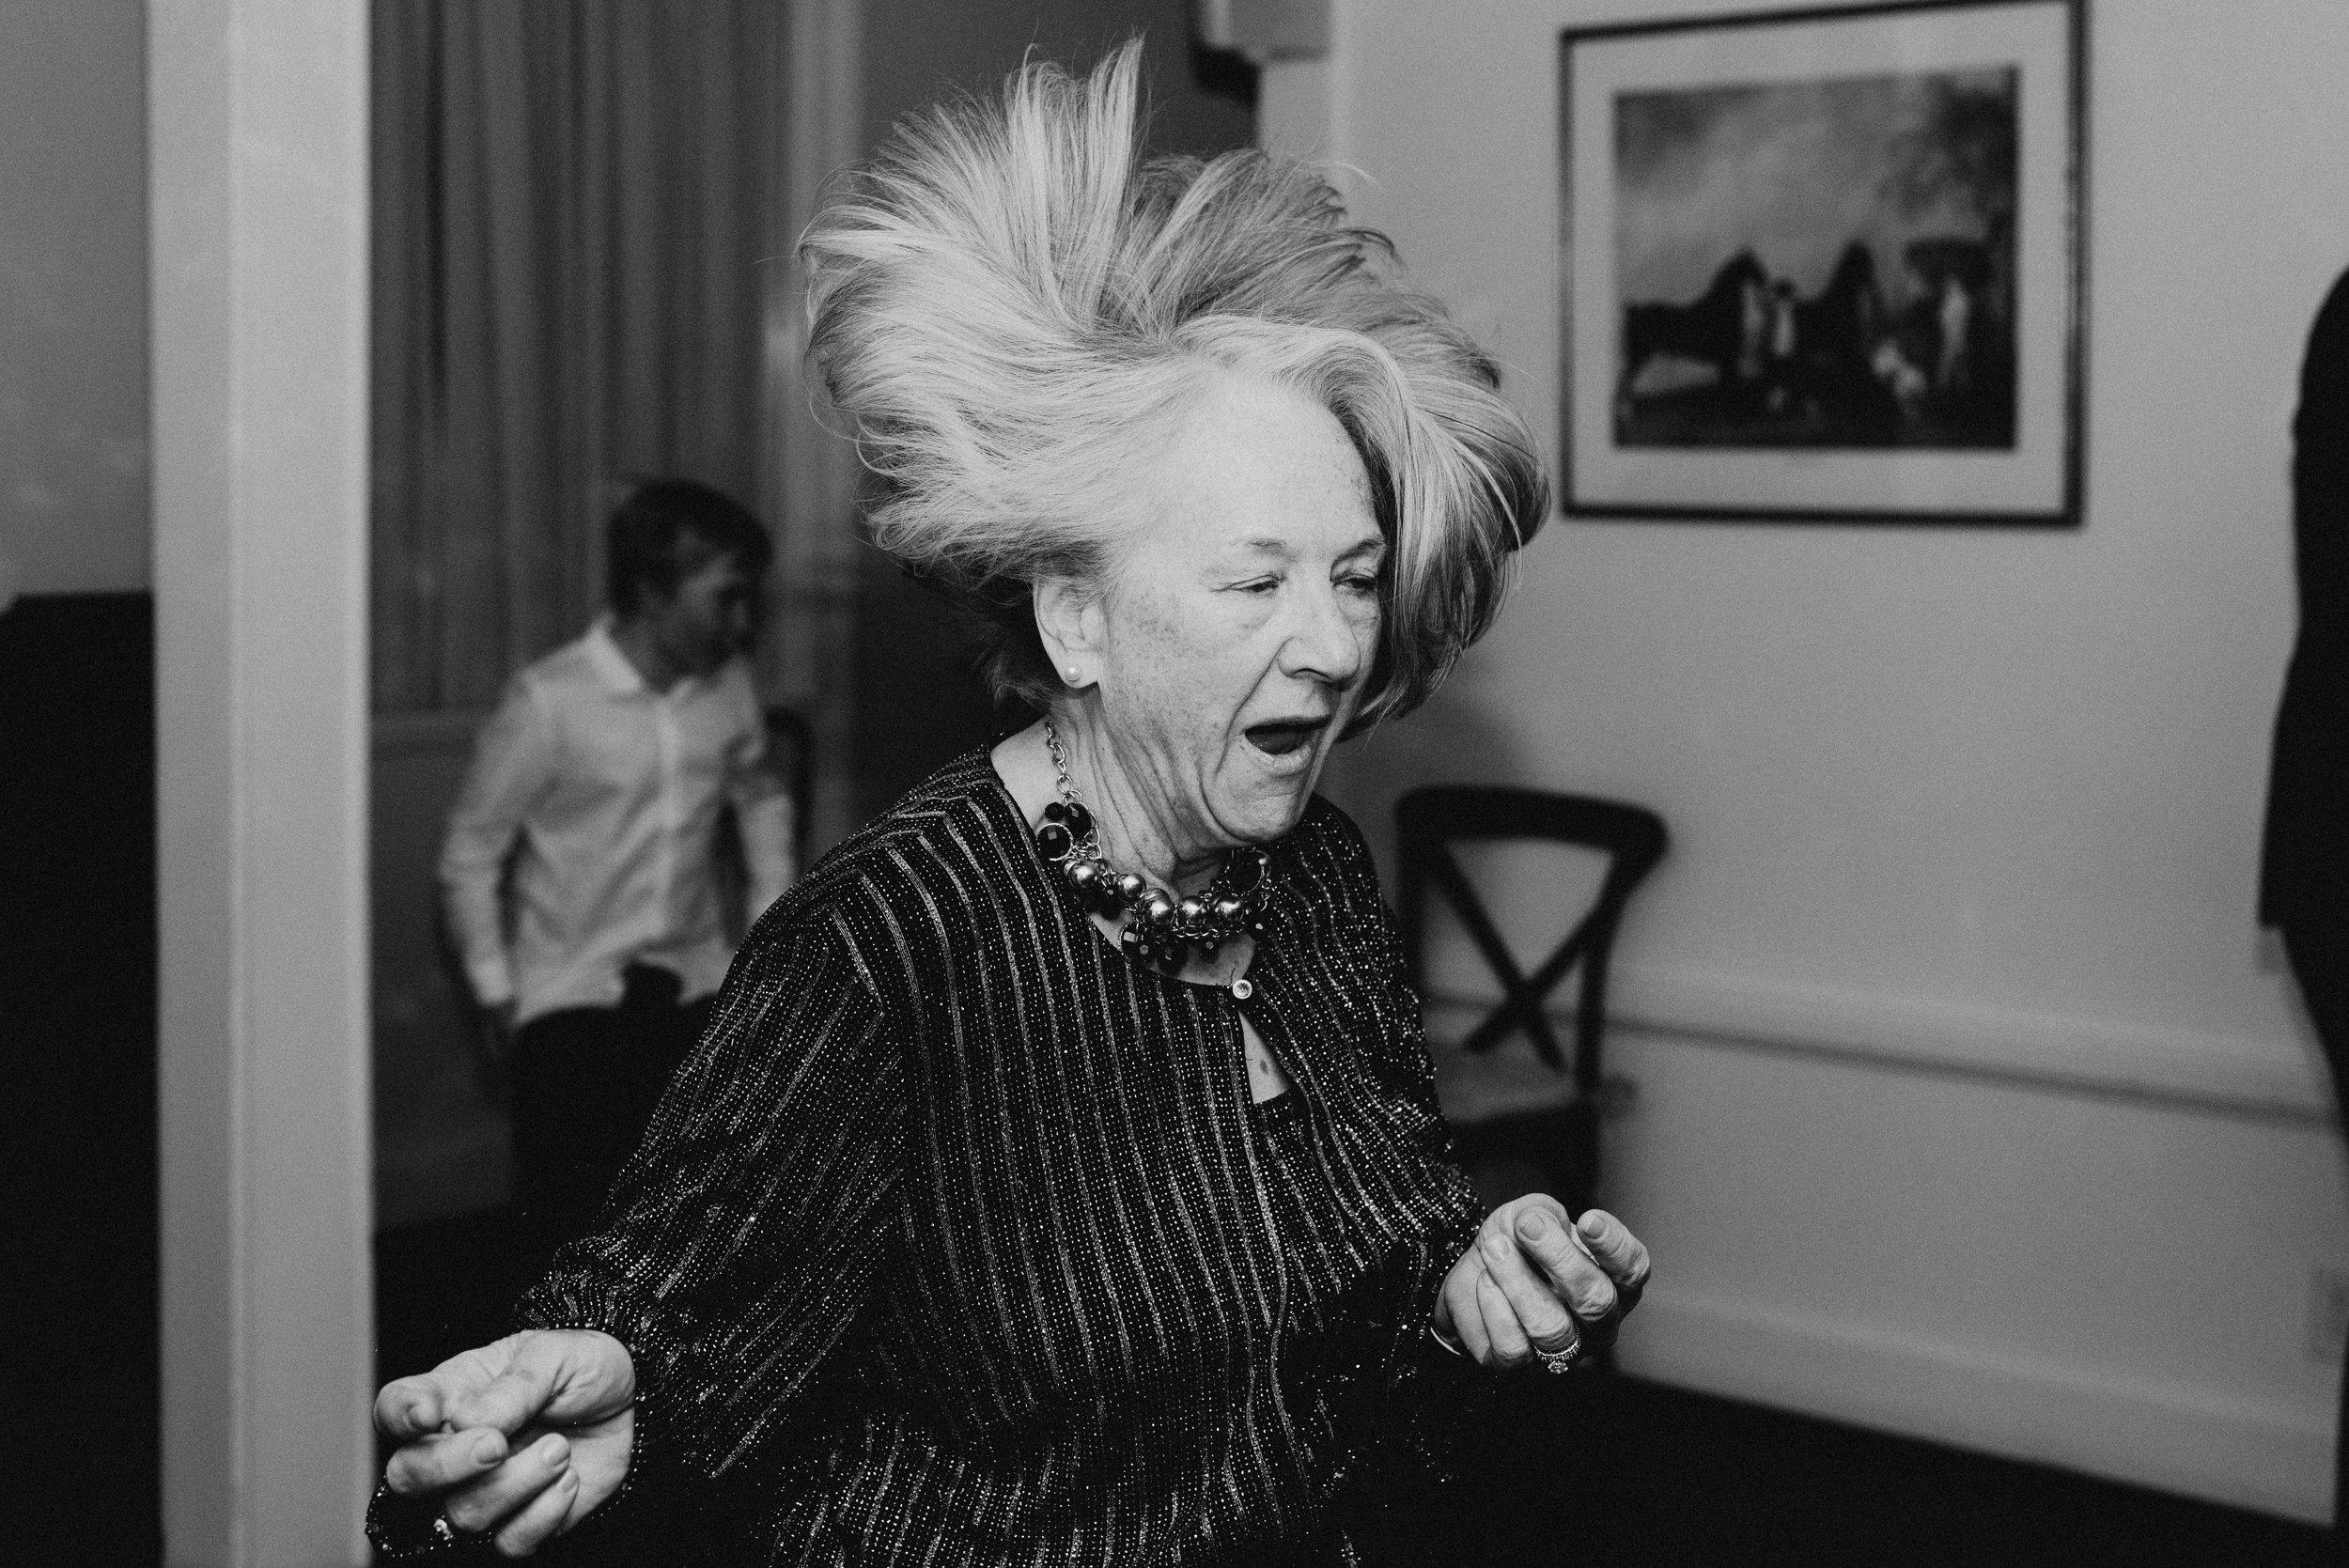 Mom rocks out at wedding reception